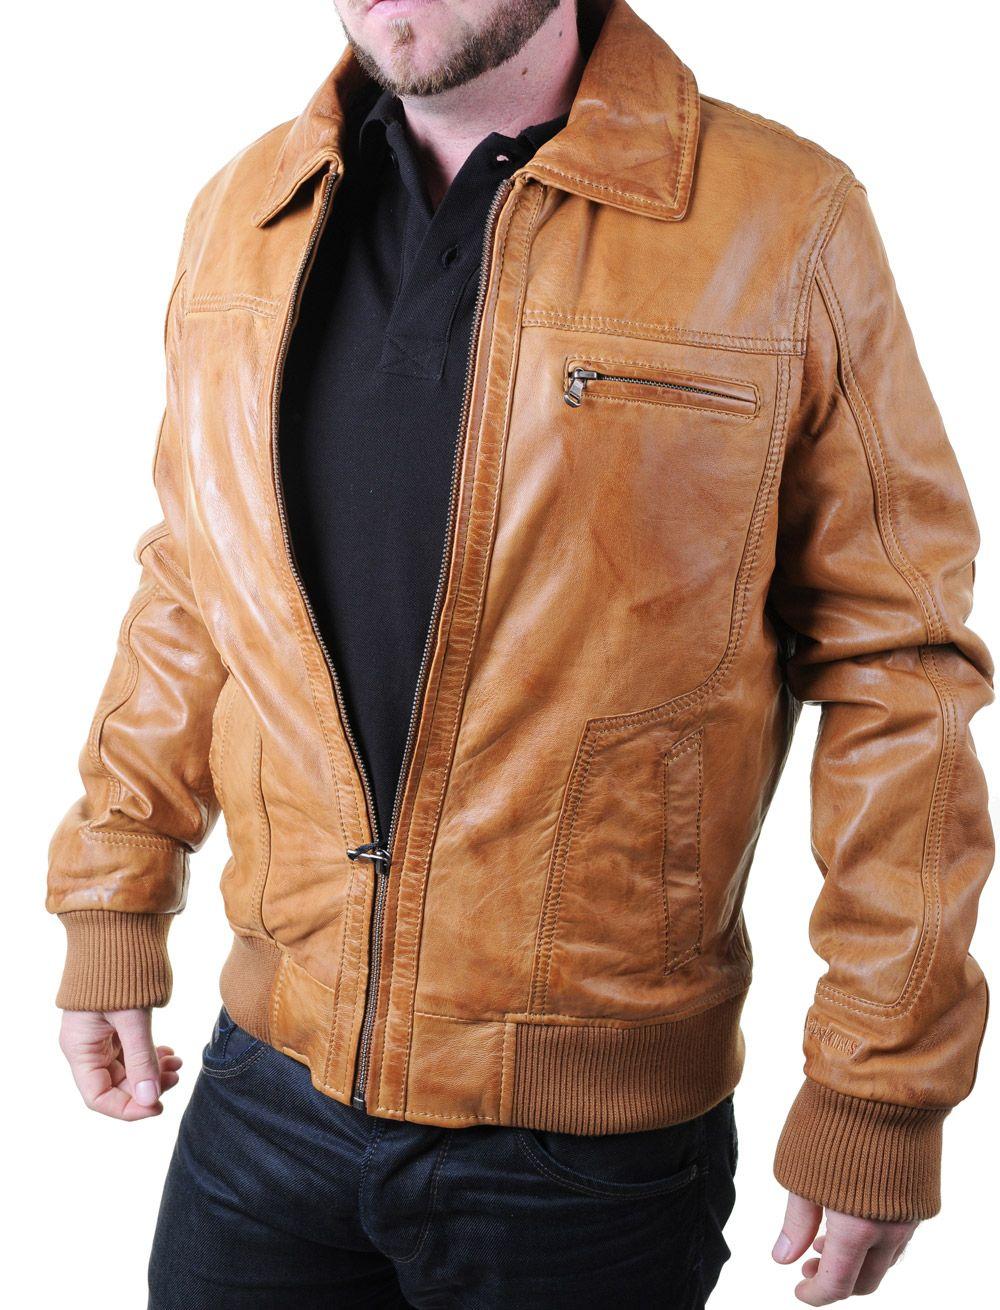 veste en cuir redskins homme cayenne rivoli marron cognac prix 322 euros tailles disponibles. Black Bedroom Furniture Sets. Home Design Ideas